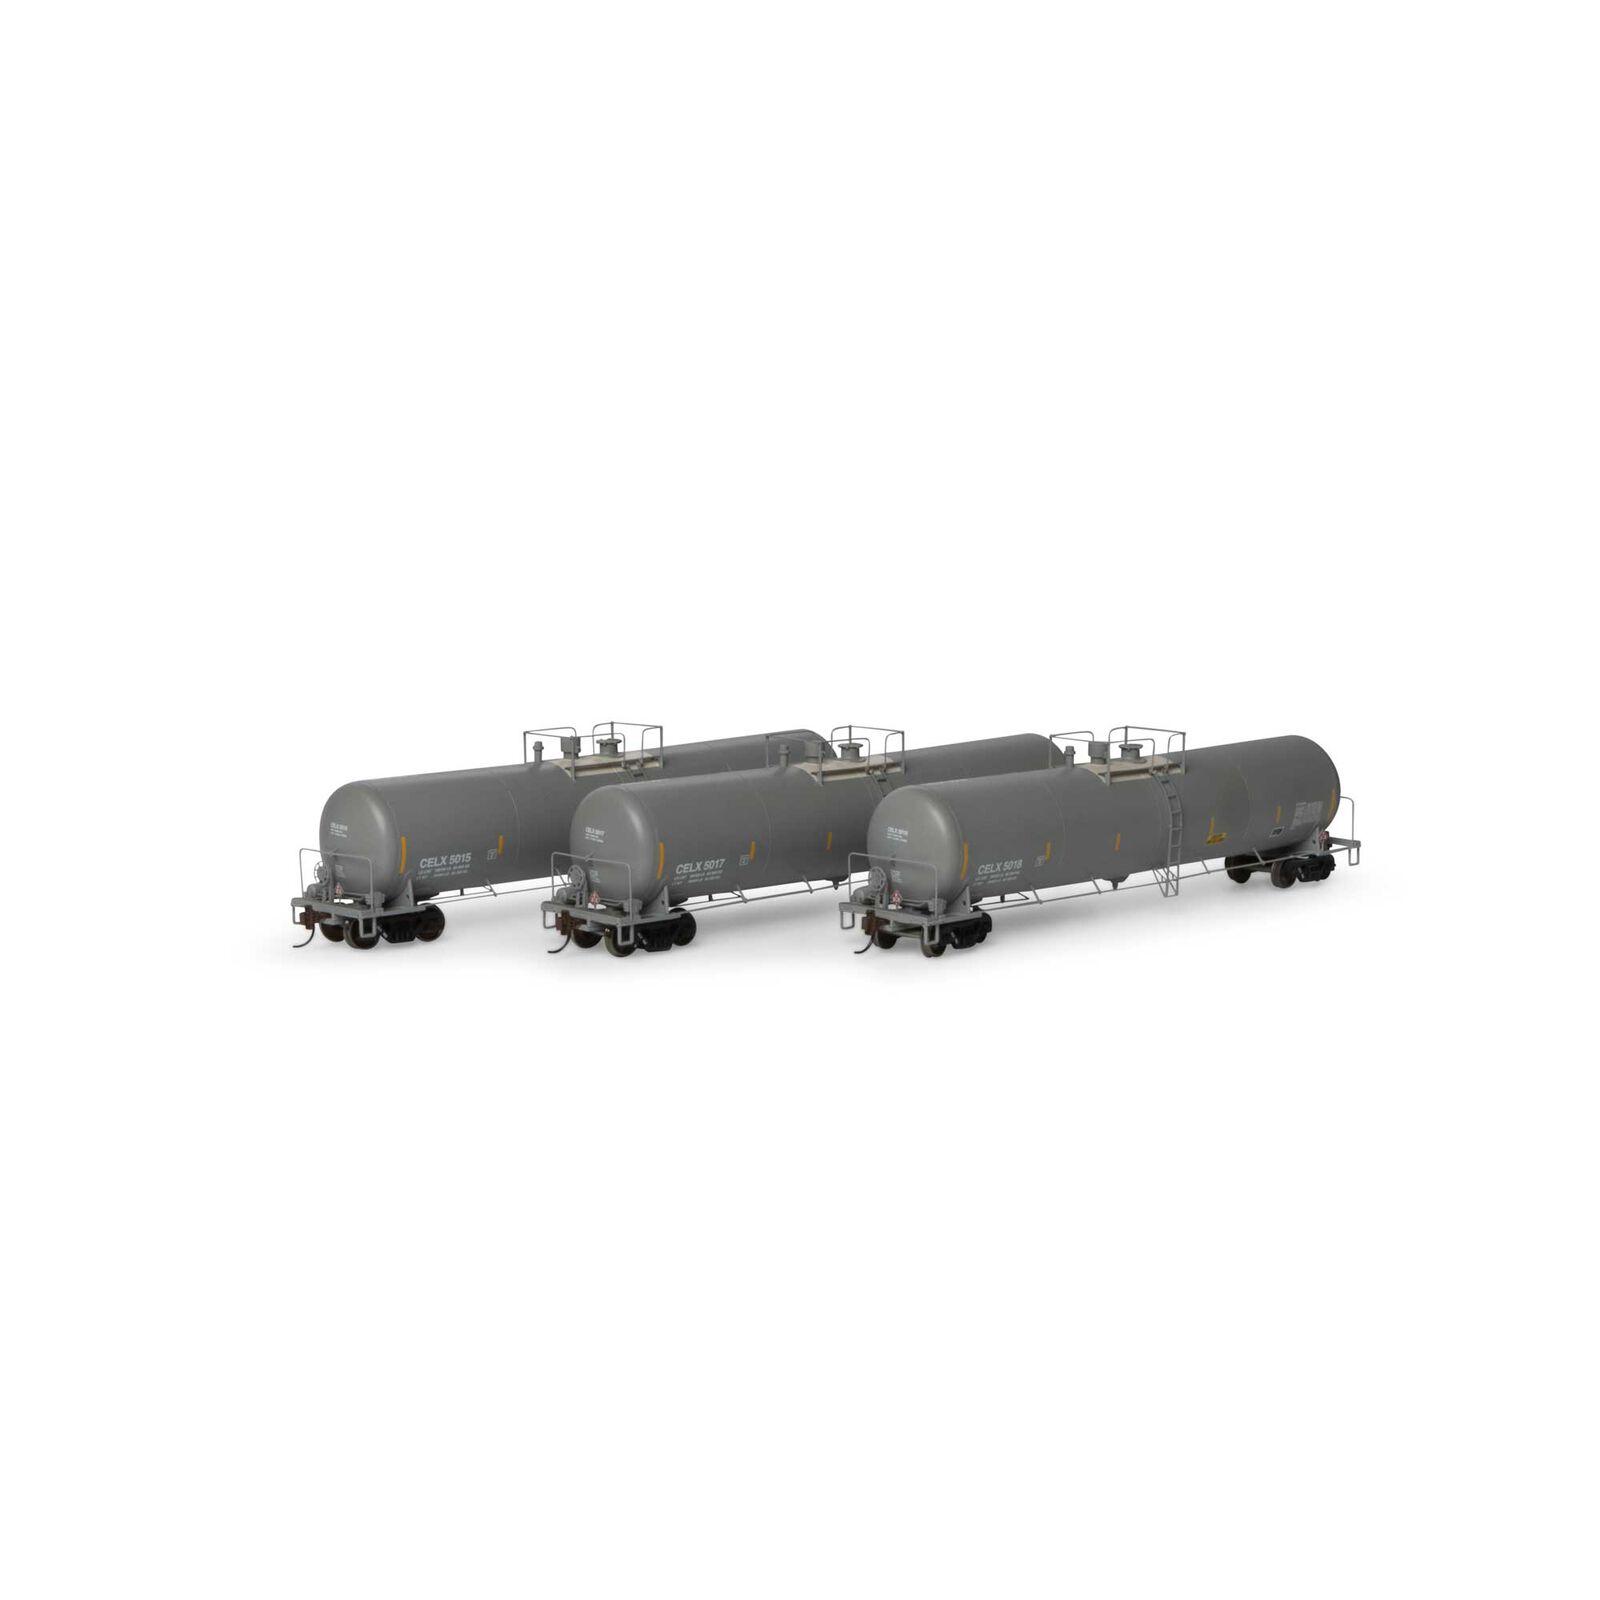 HO RTR 30 000 Gallon Ethanol Tank CELX #3 (3)